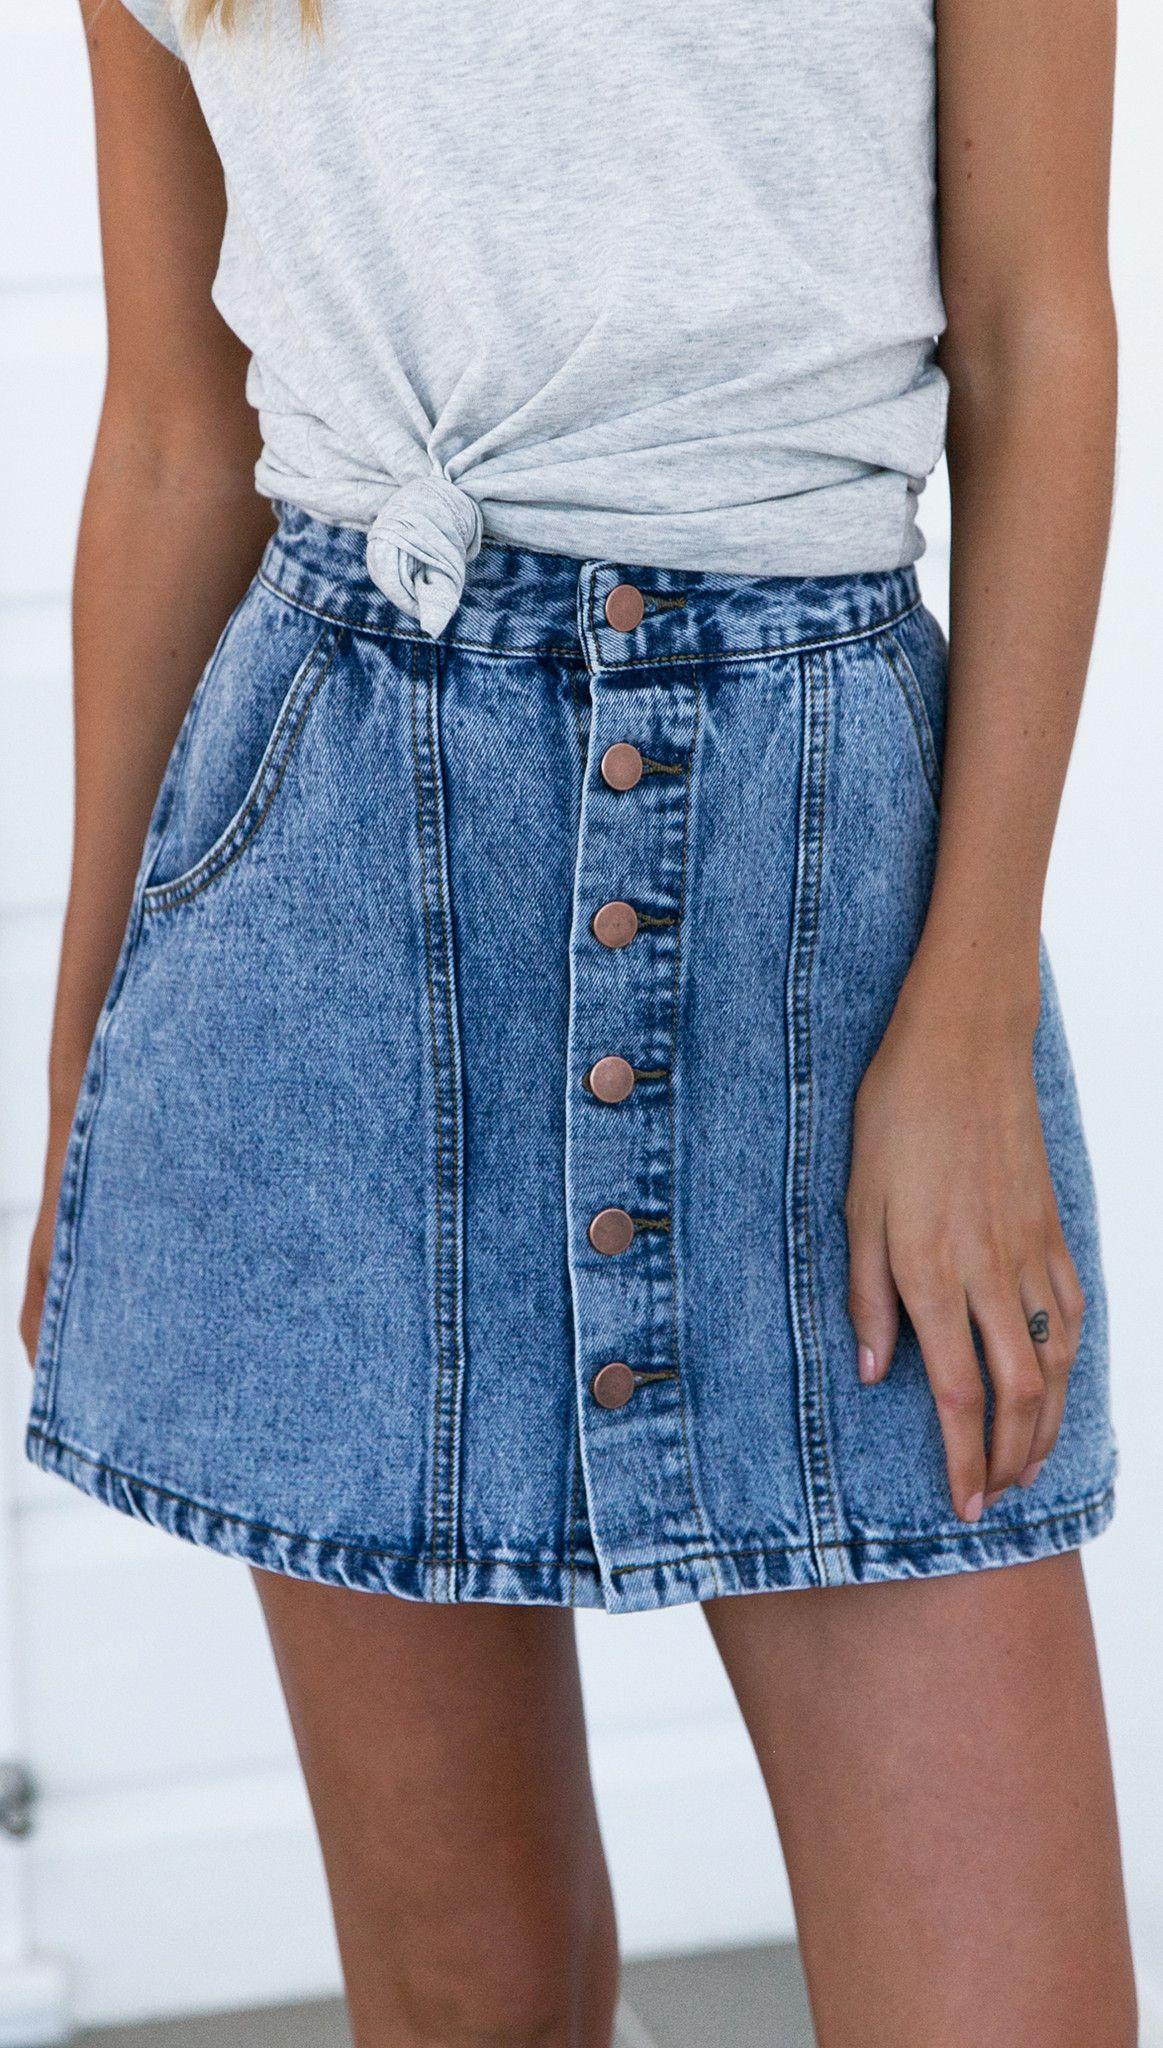 Northern Blues Skirt